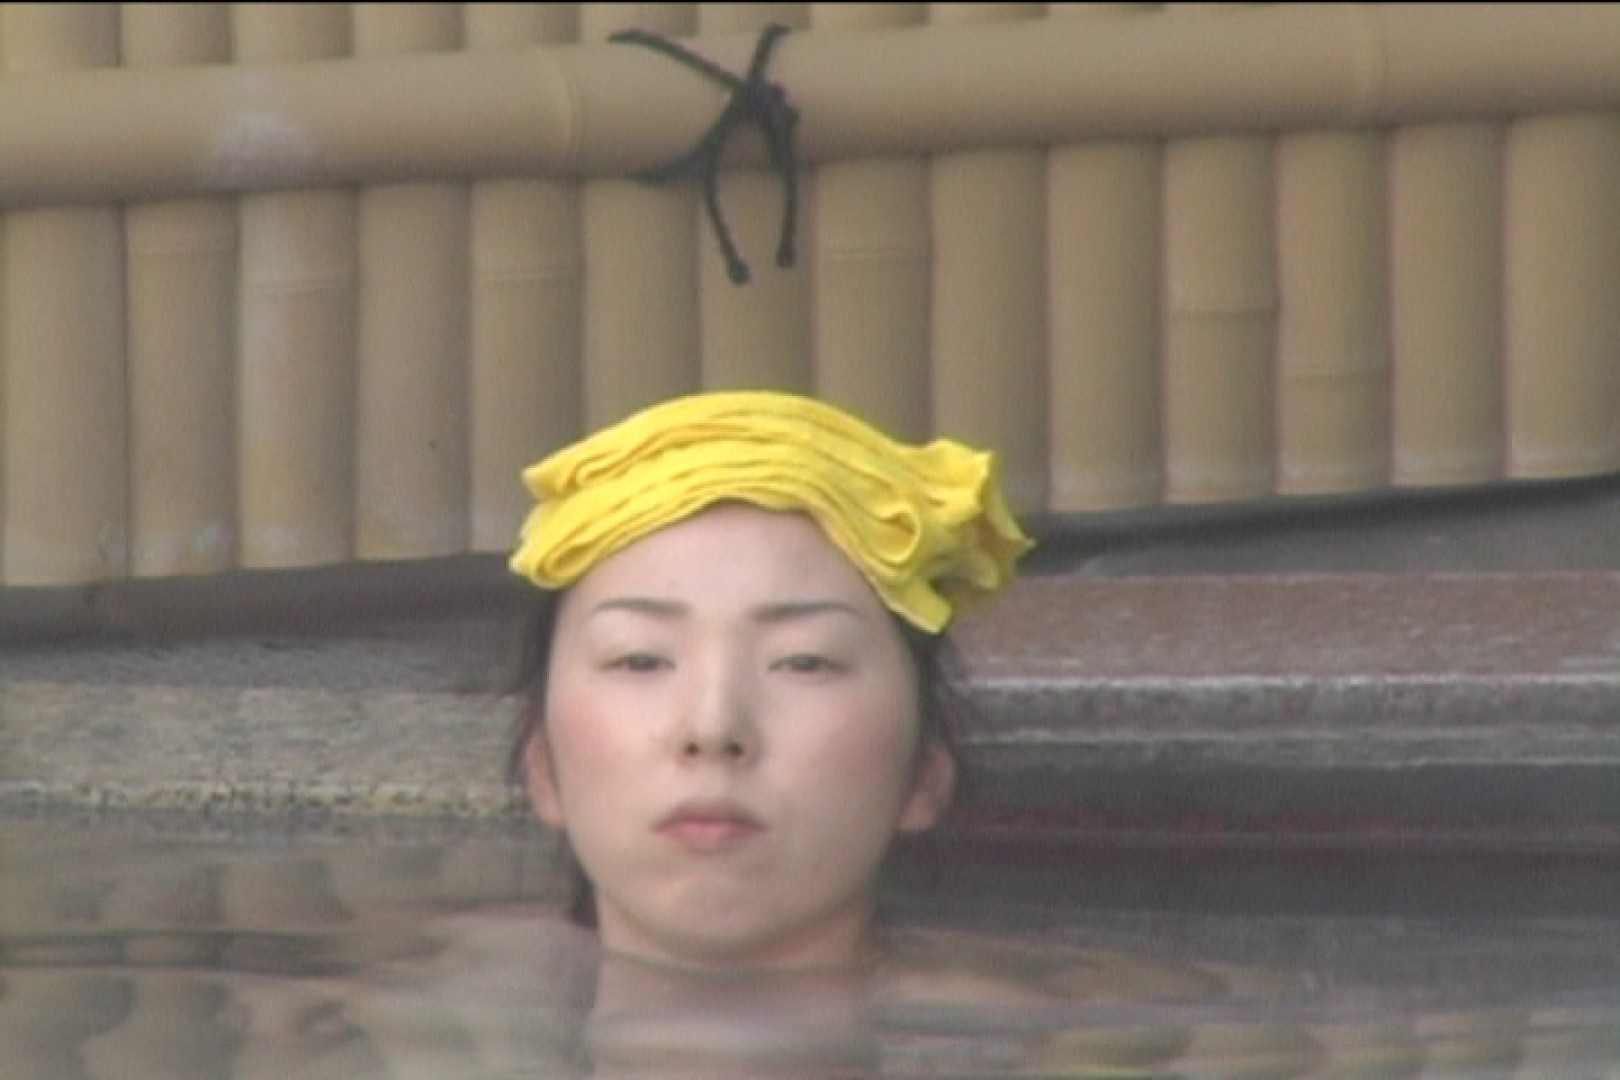 Aquaな露天風呂Vol.529 盗撮シリーズ | 露天風呂編  106PIX 15